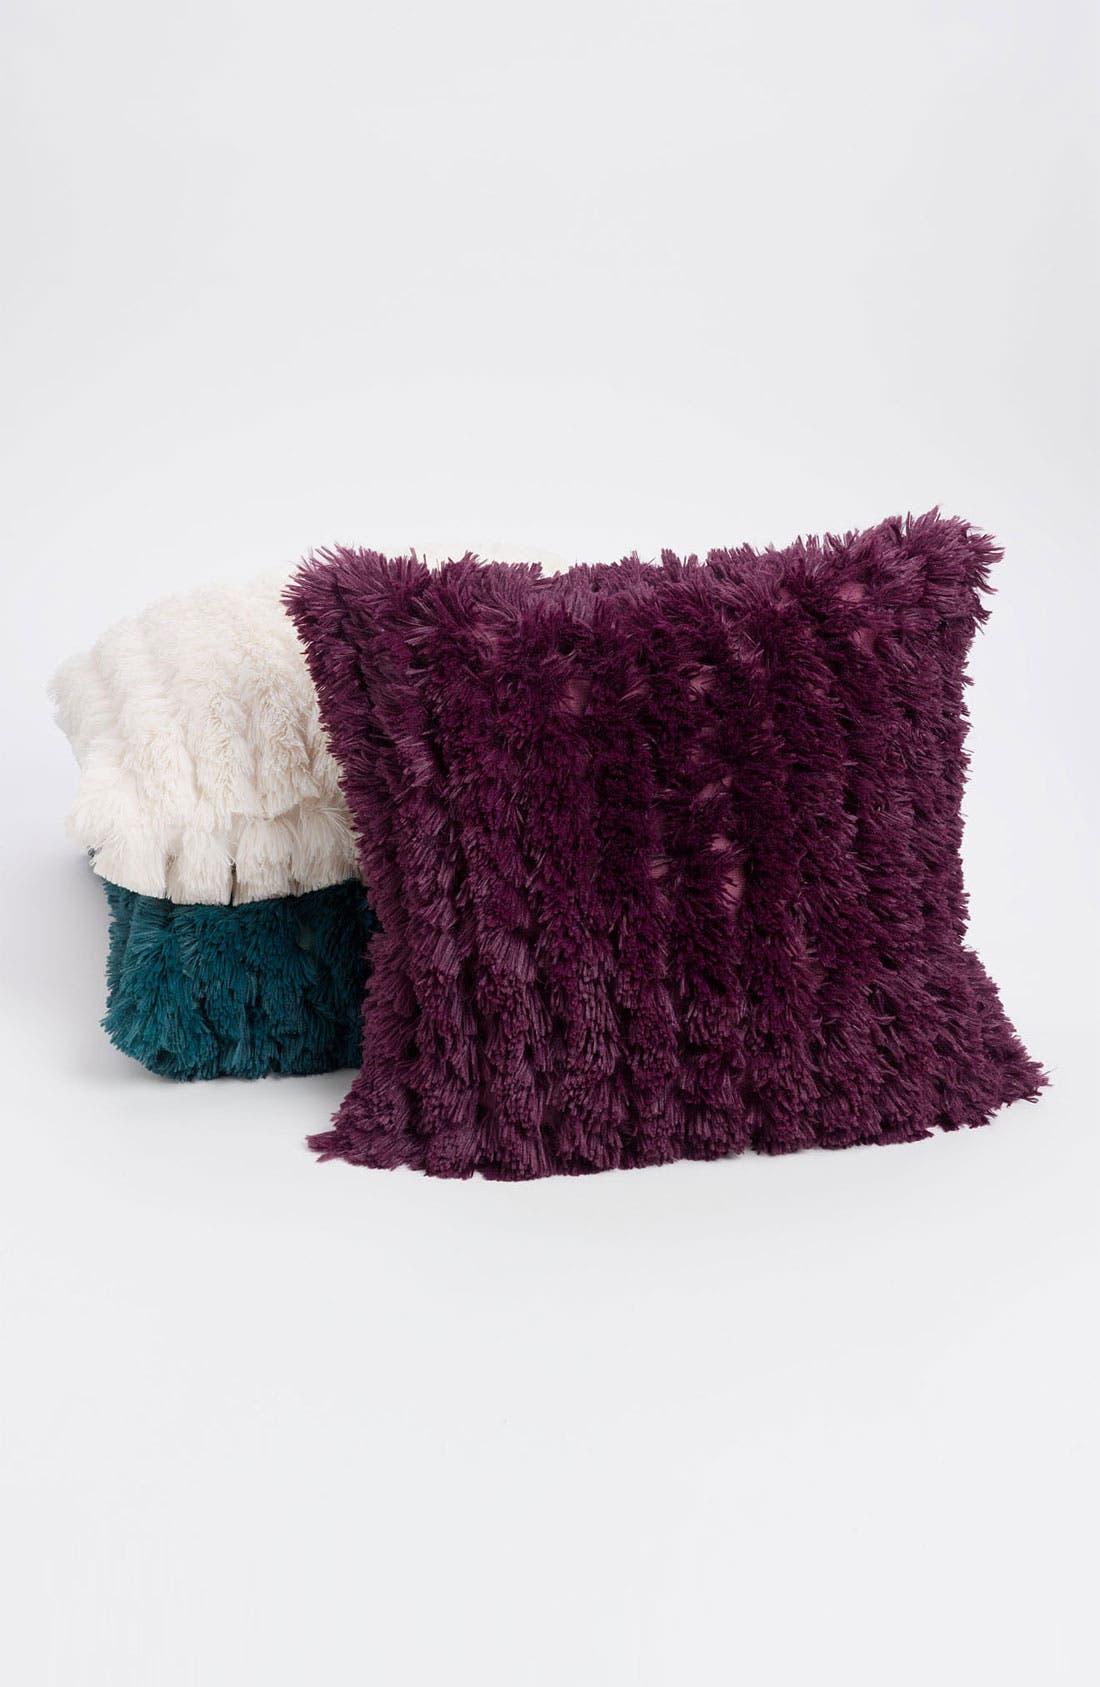 Alternate Image 1 Selected - Spencer N. Home 'Pompom' Pillow